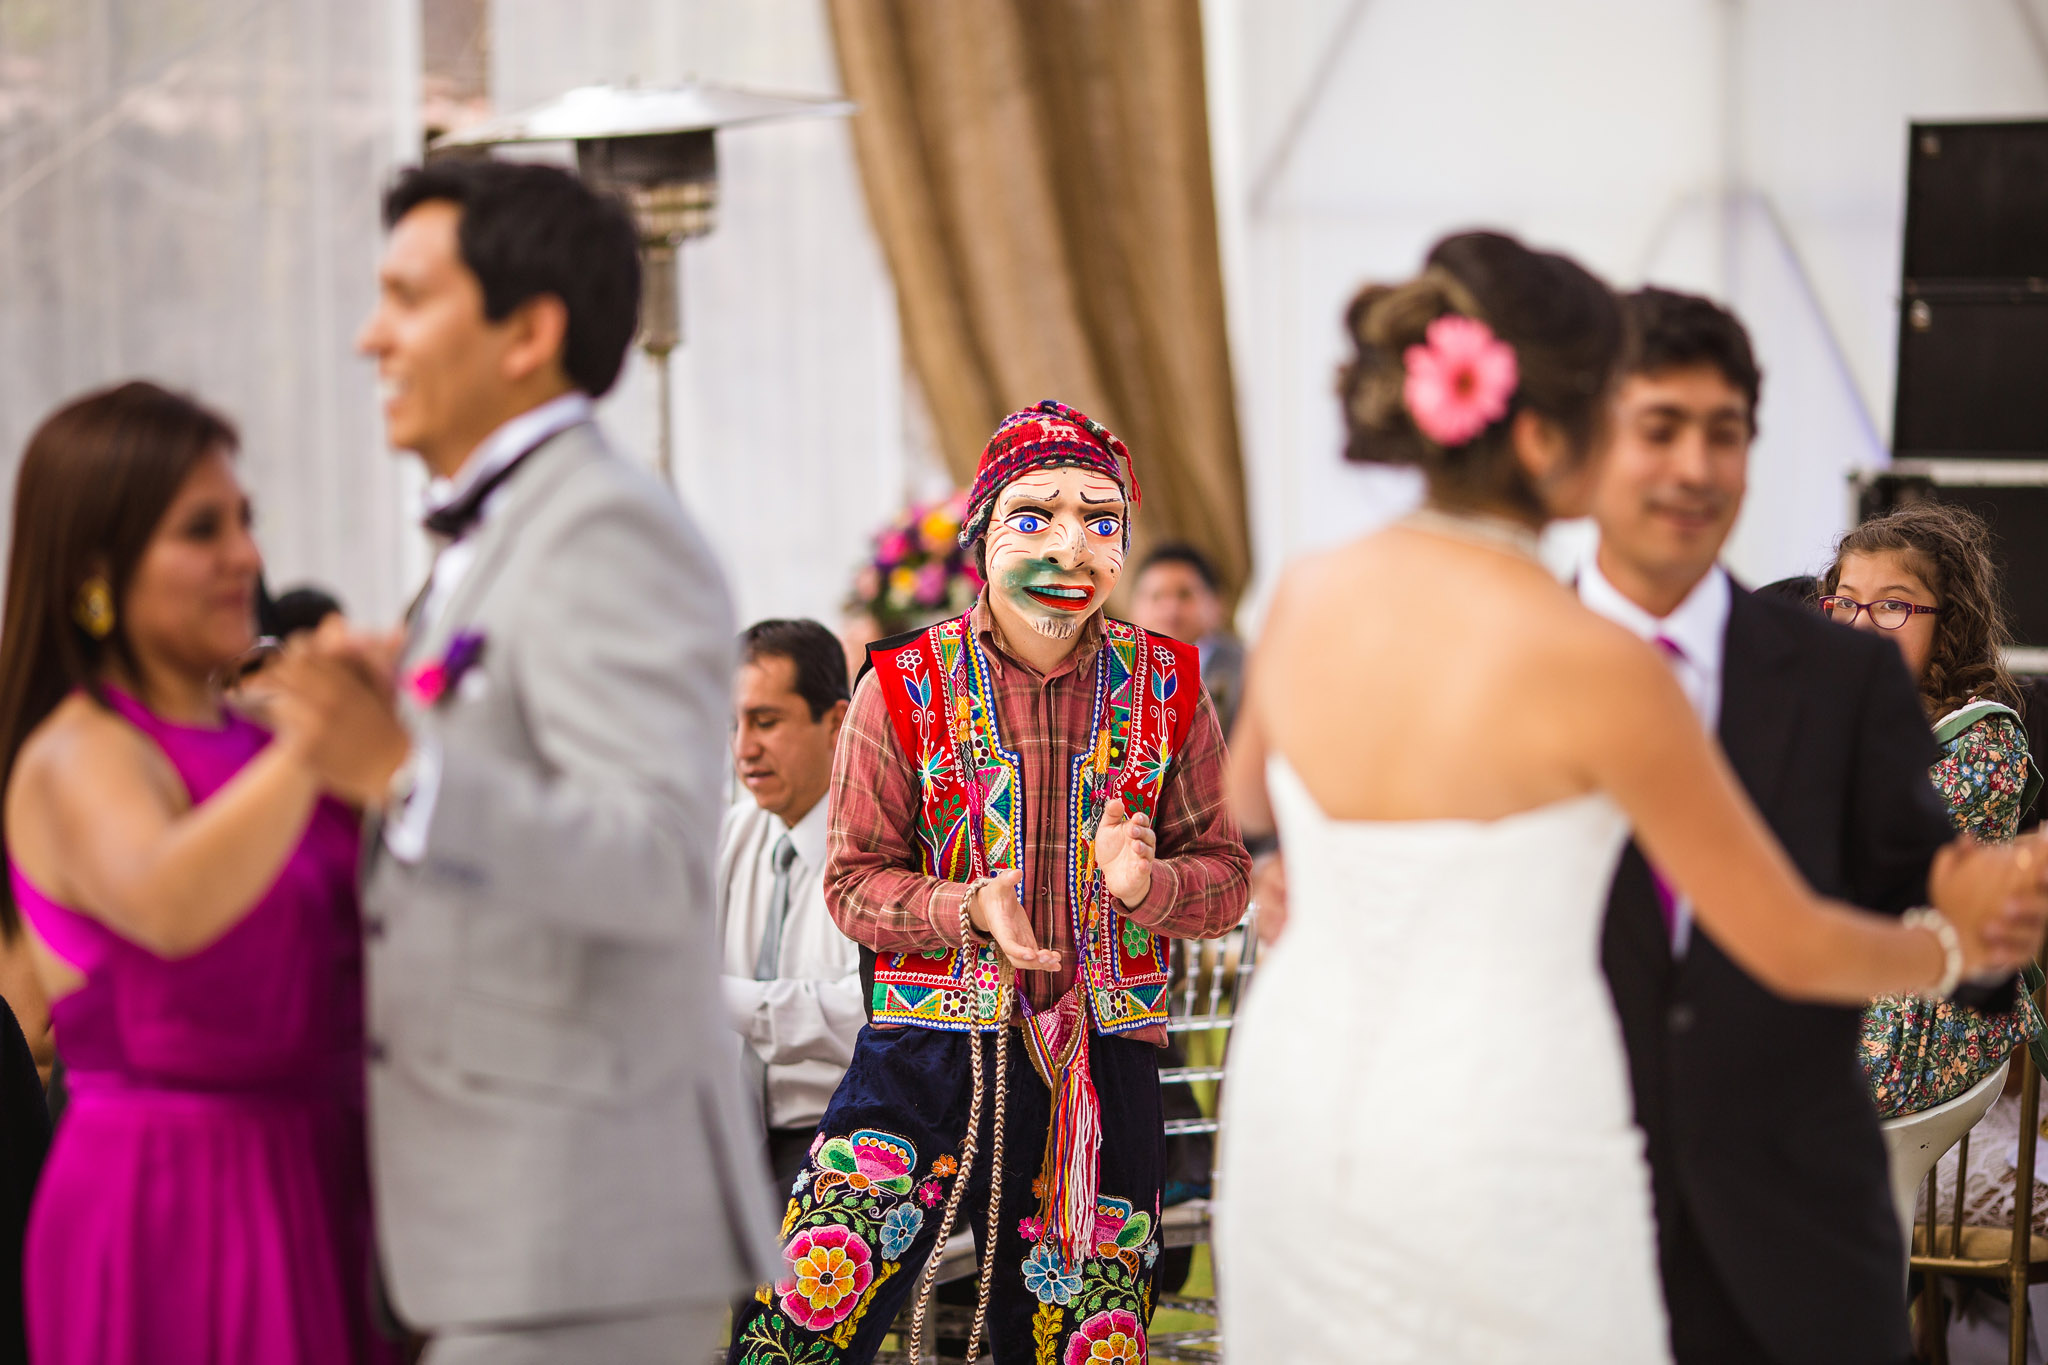 Wedding-Travellers-Destination-Wedding-Peru-Cusco-Hacienda-Sarapampa-Sacred-Valley-dance